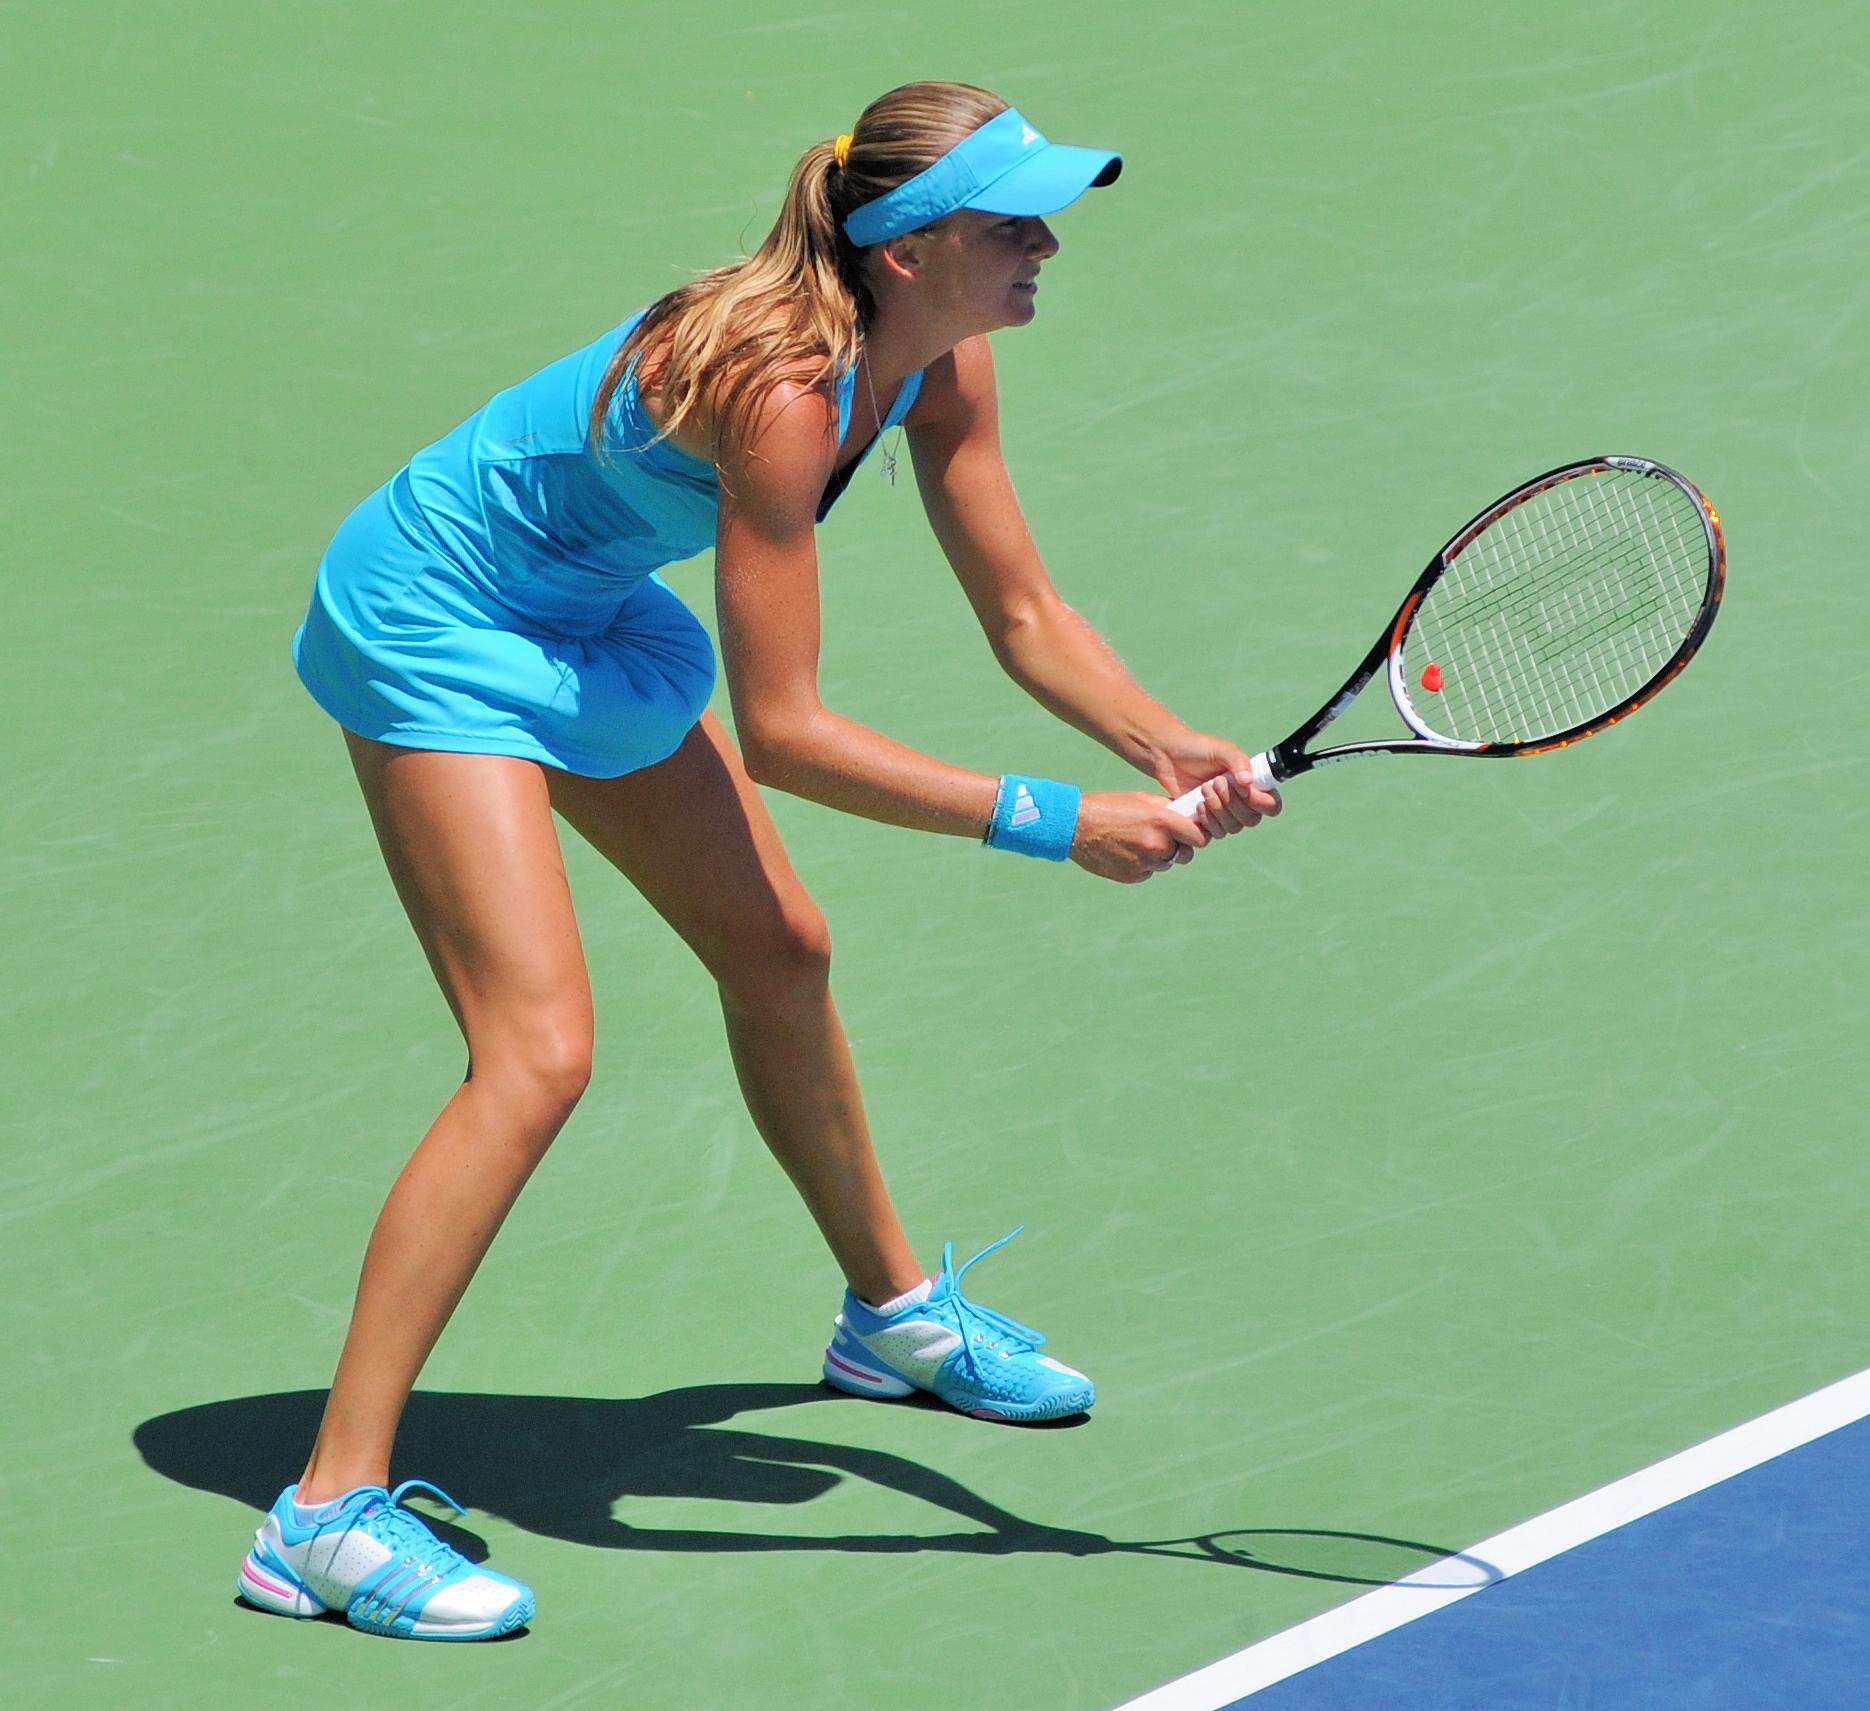 Girls Tennis Shoes Sale Australia